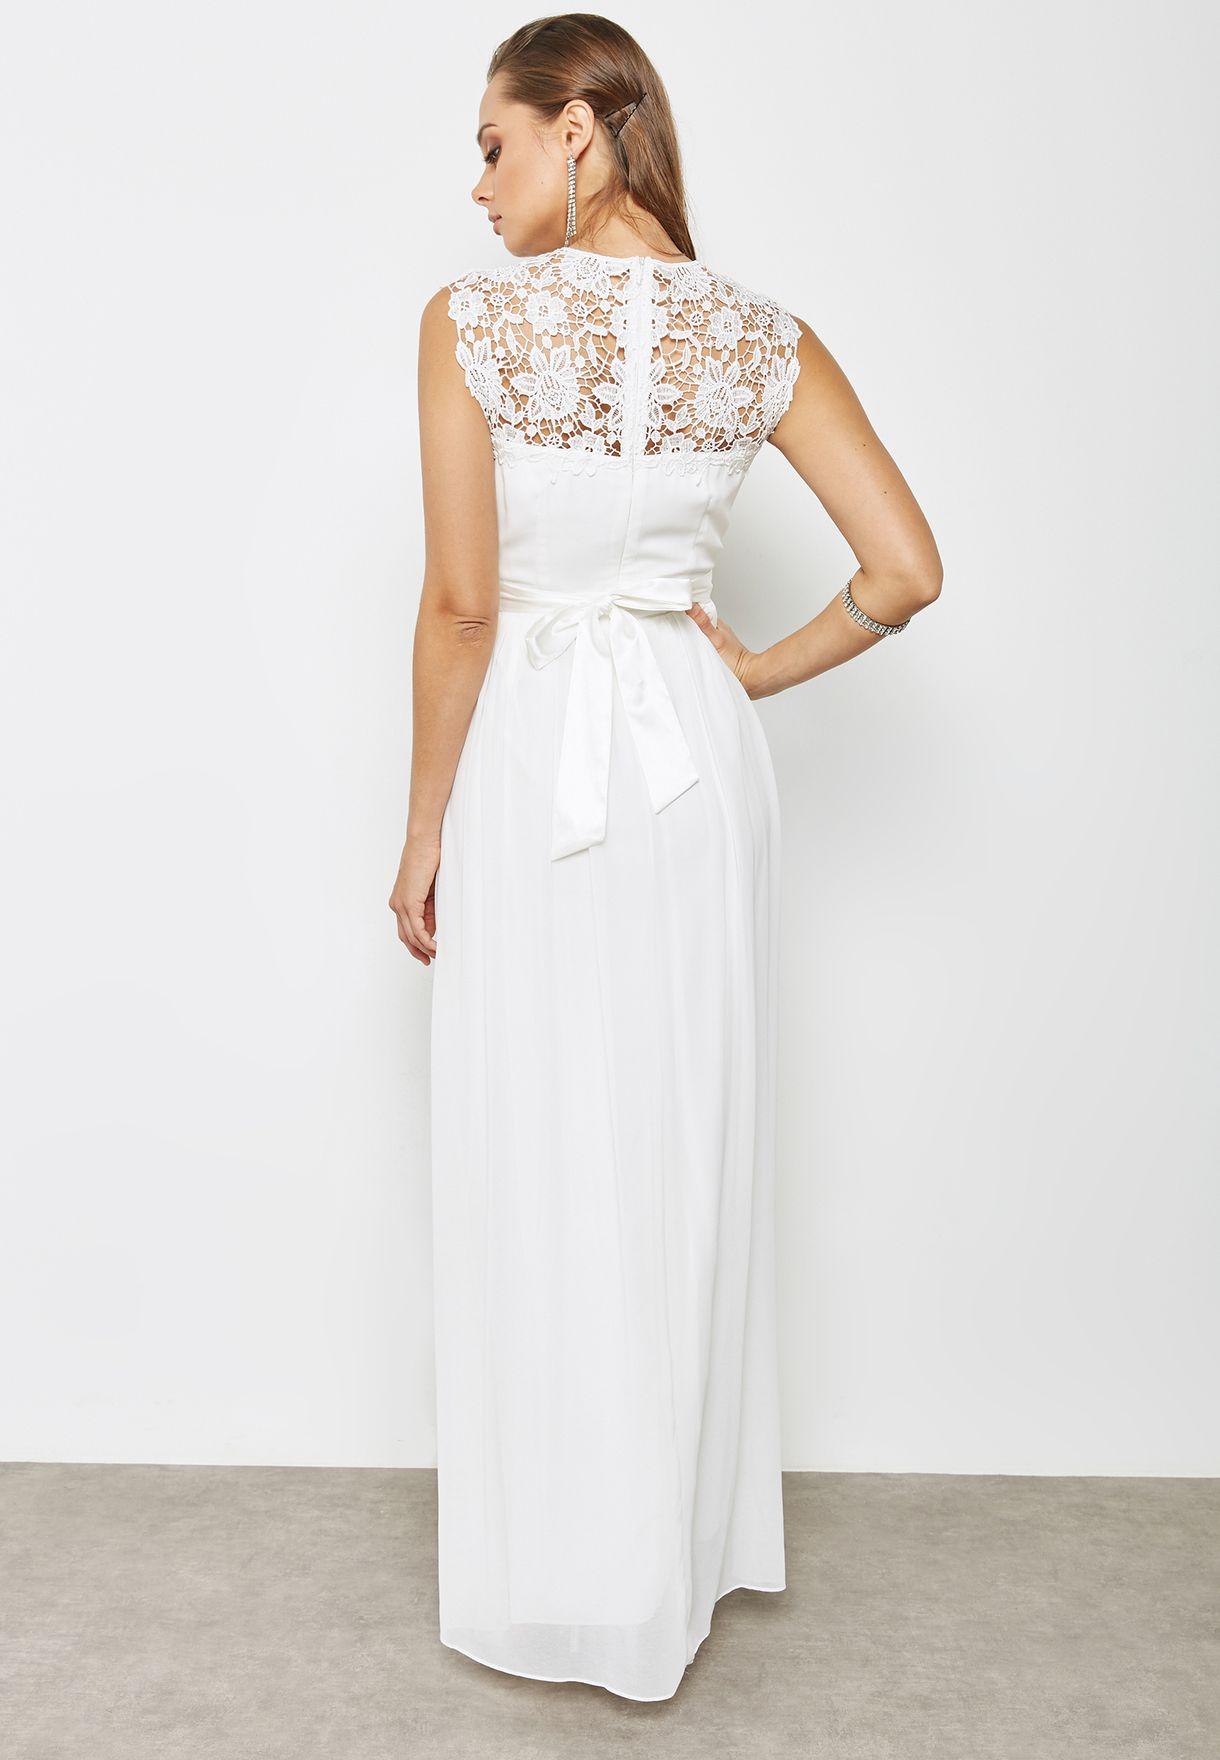 Lace Detail Bridal Maxi Dress